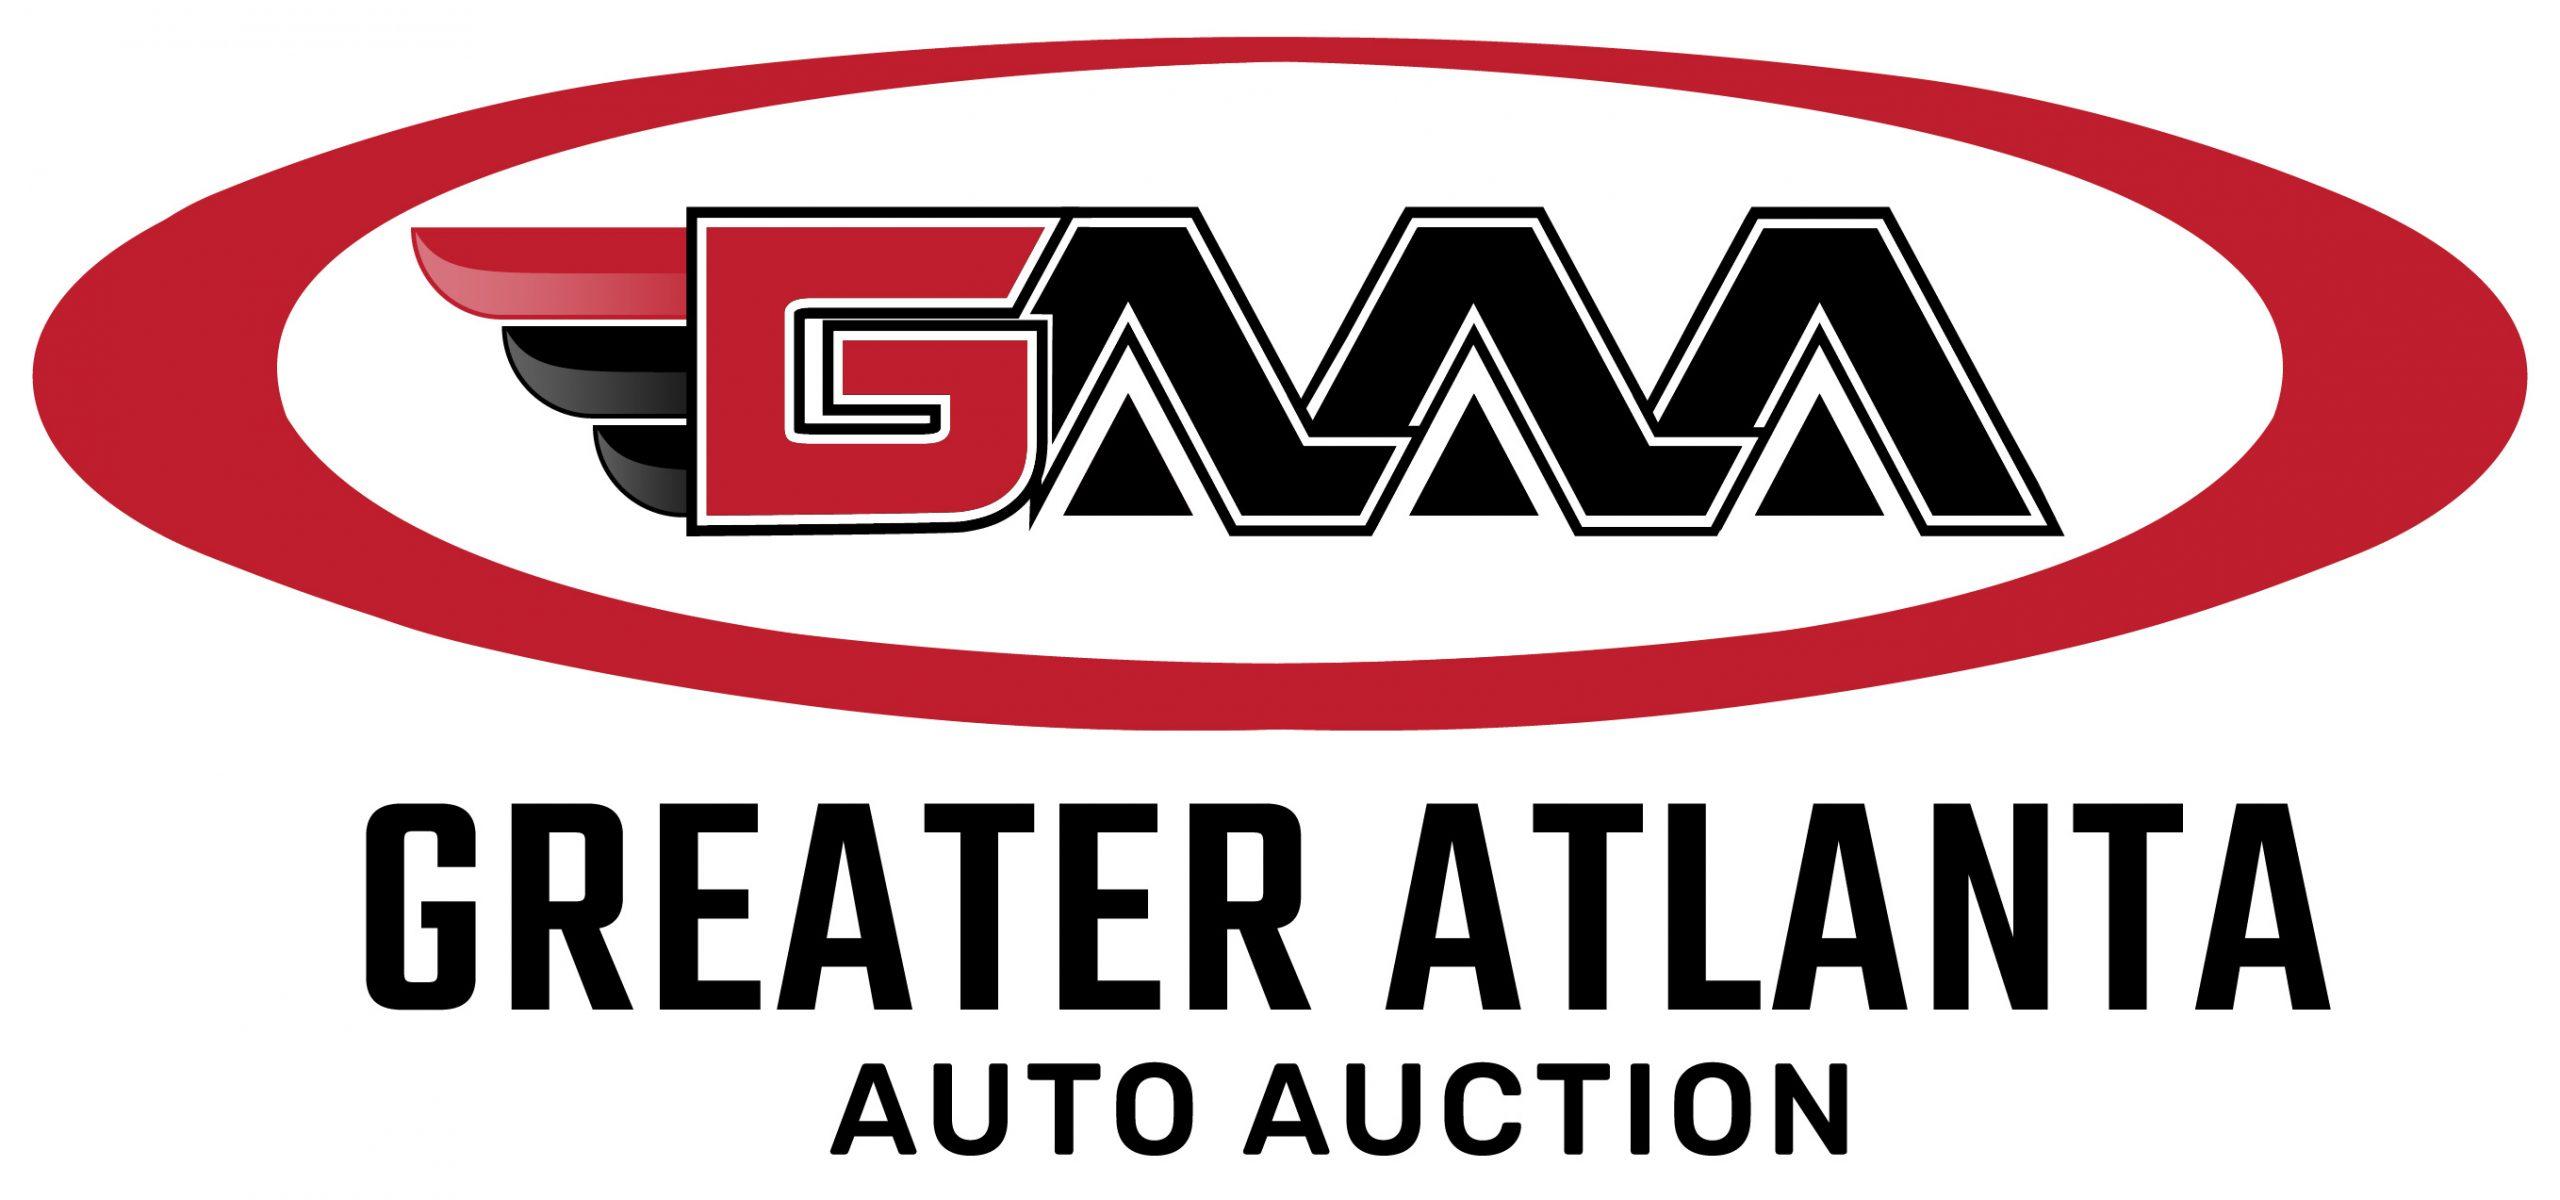 Greater Atlanta Auto Auction